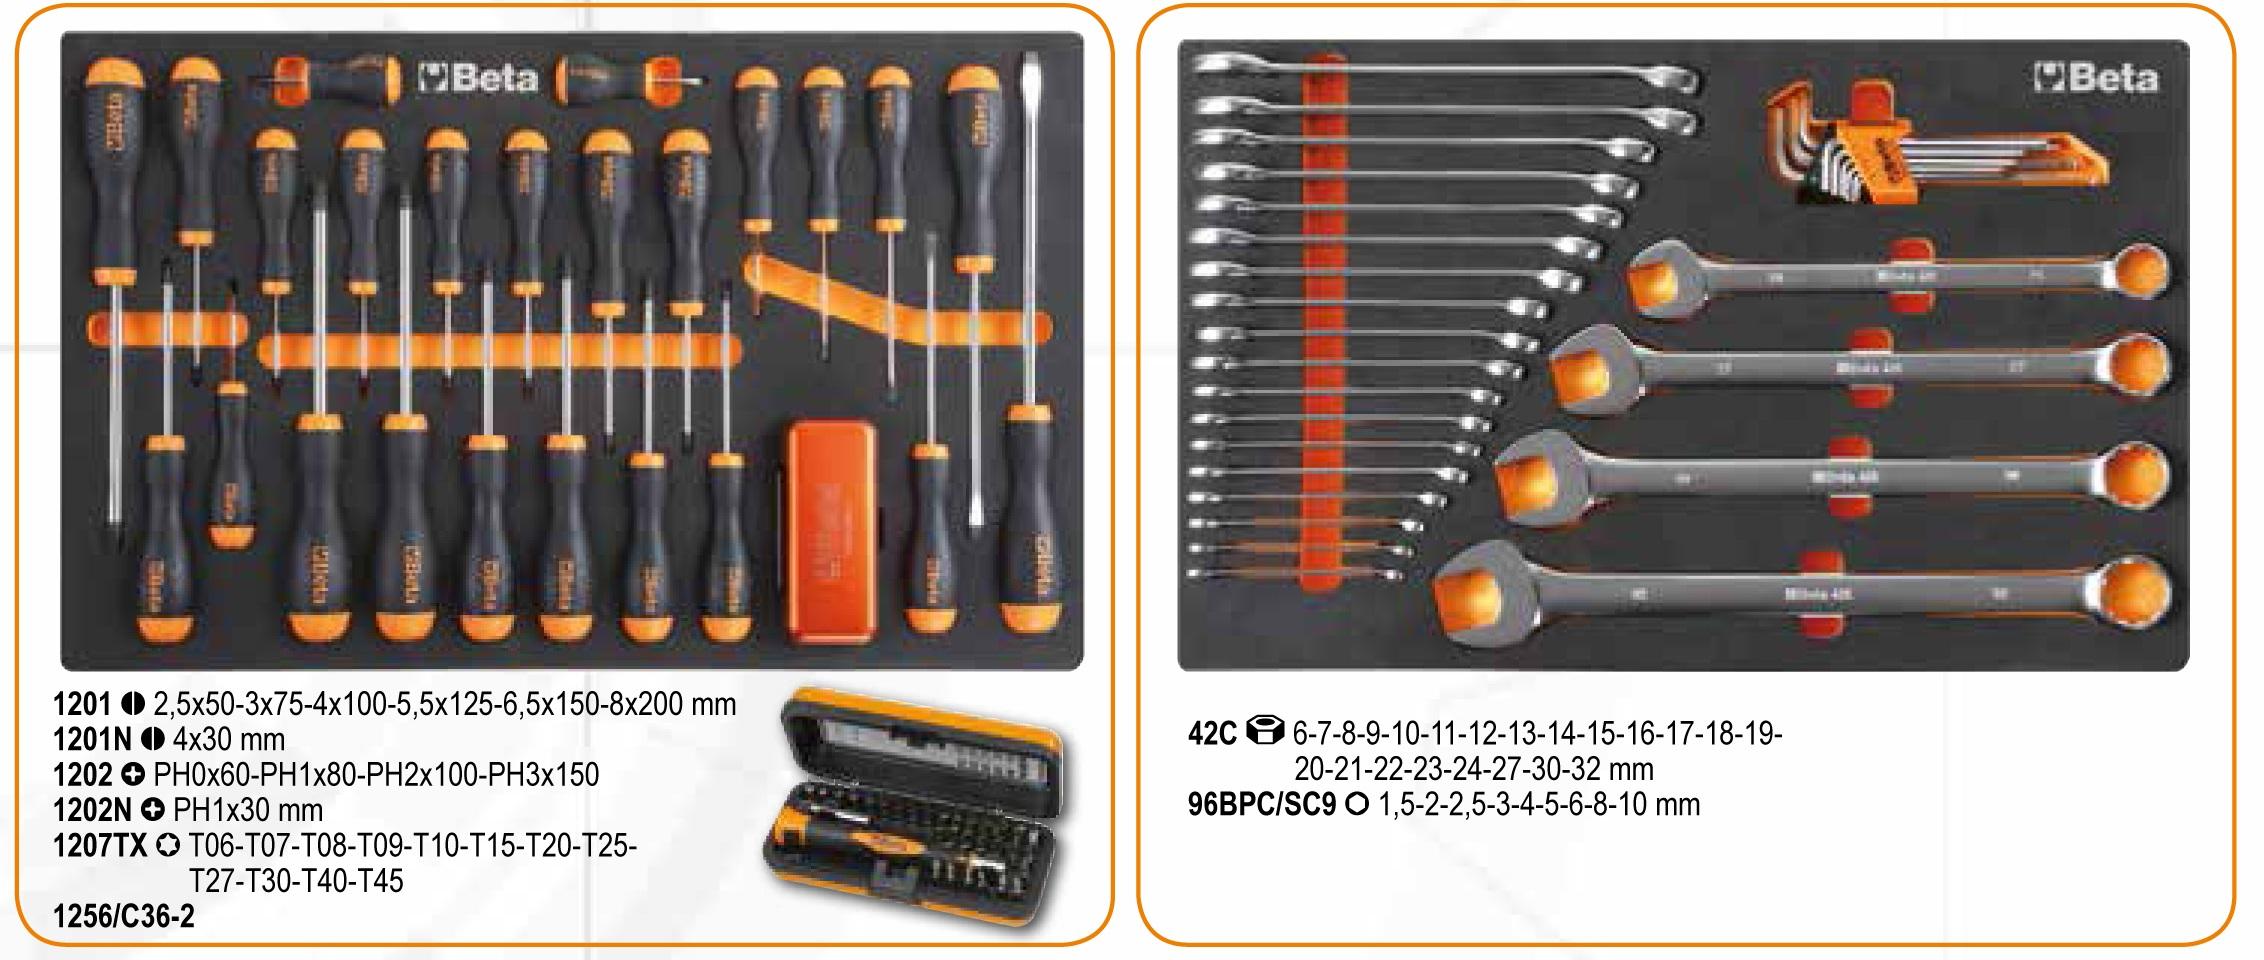 módulo ferramentas